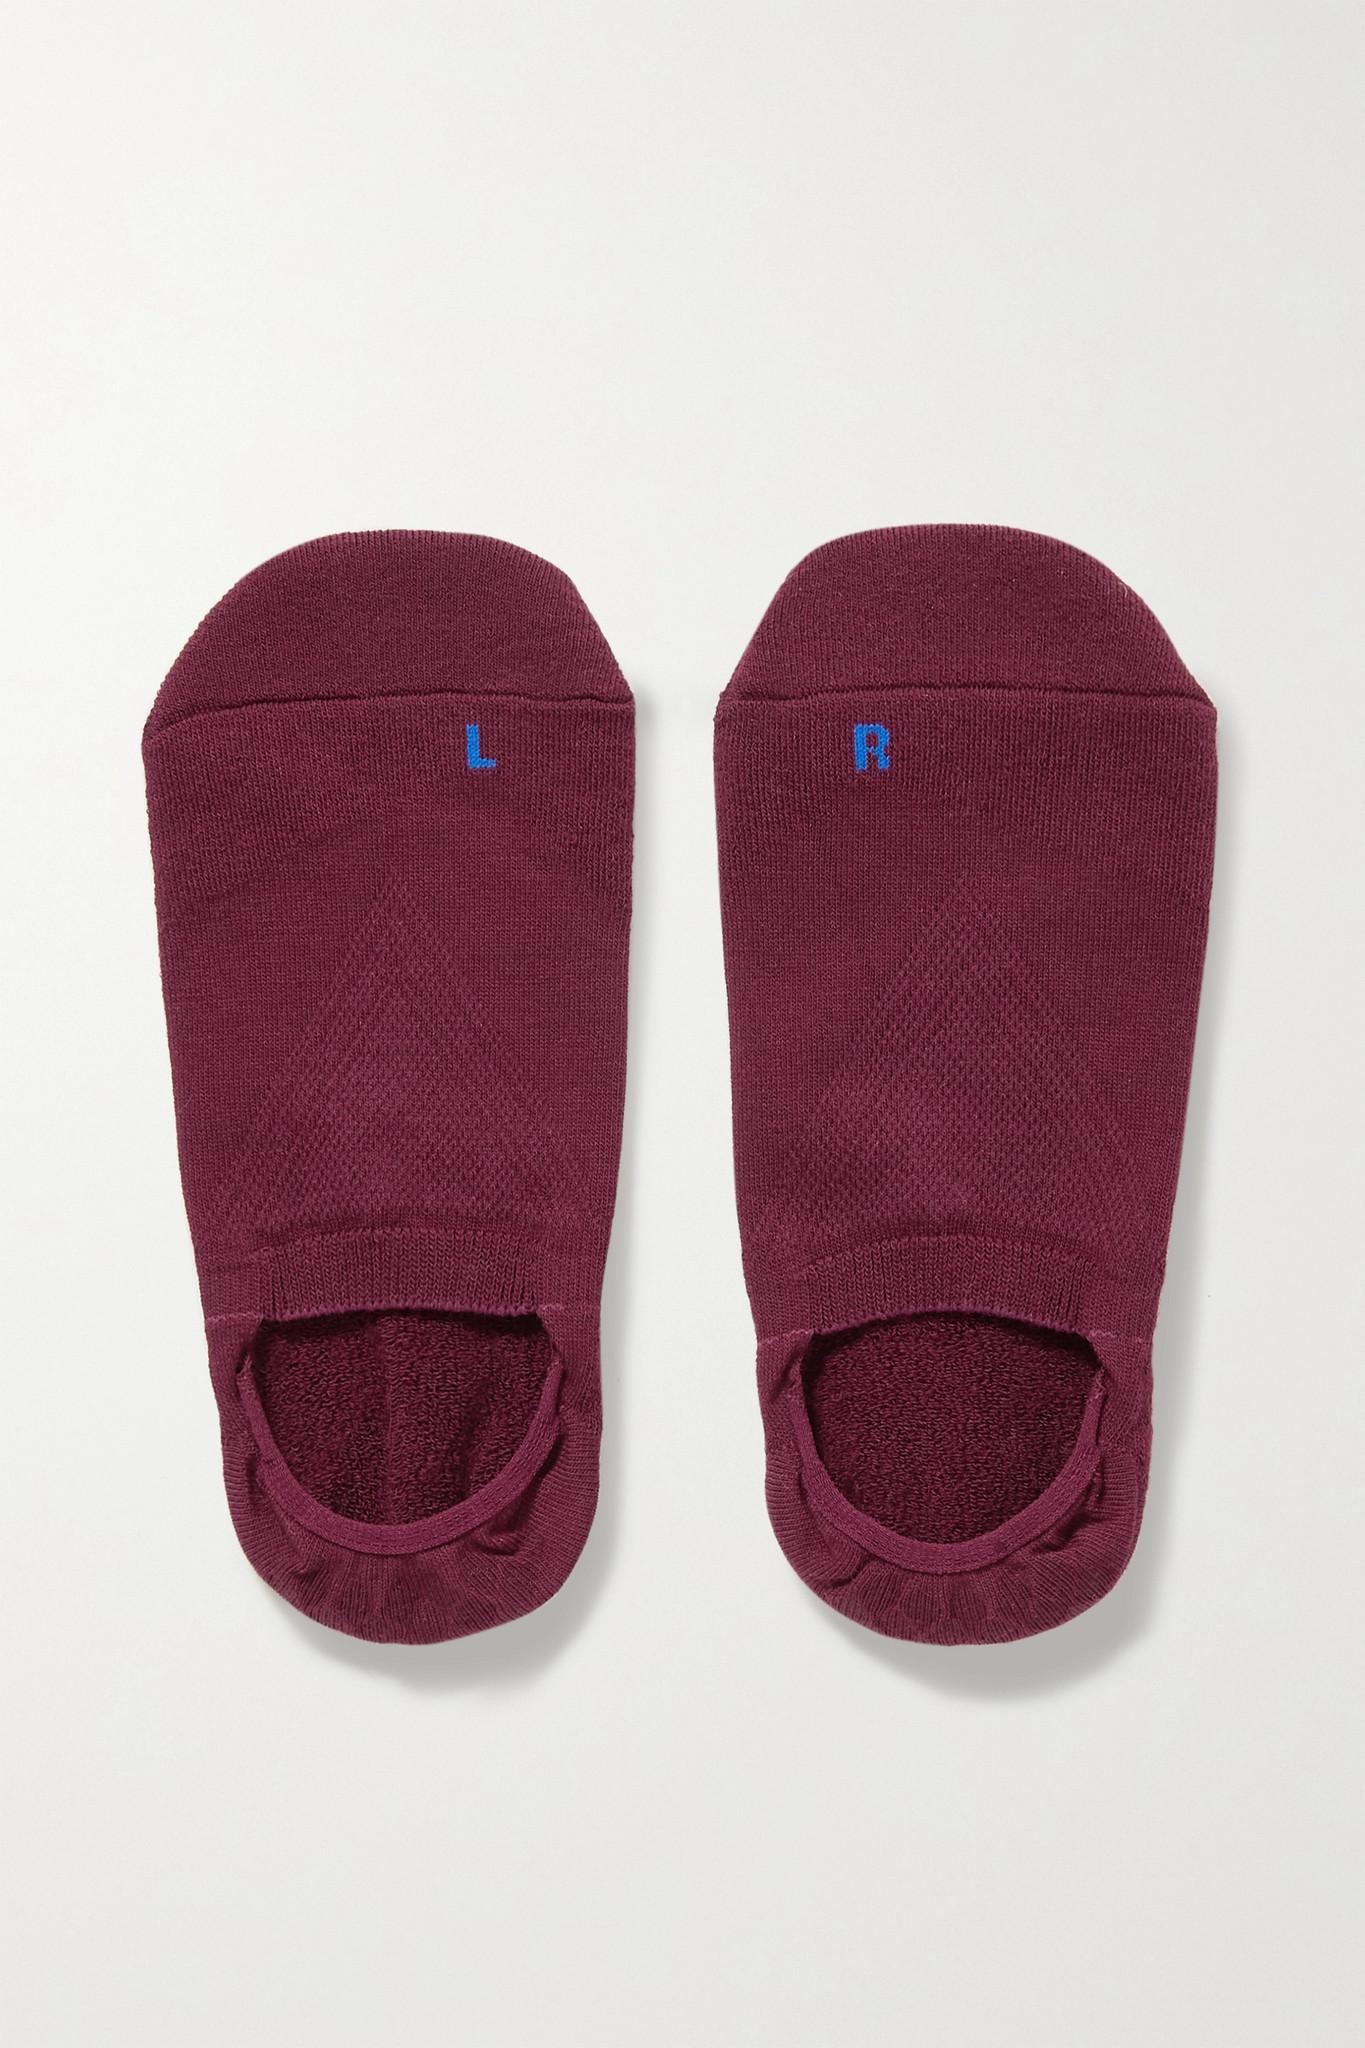 FALKE - Cool Kick 弹力针织袜子 - 紫色 - EU37-38